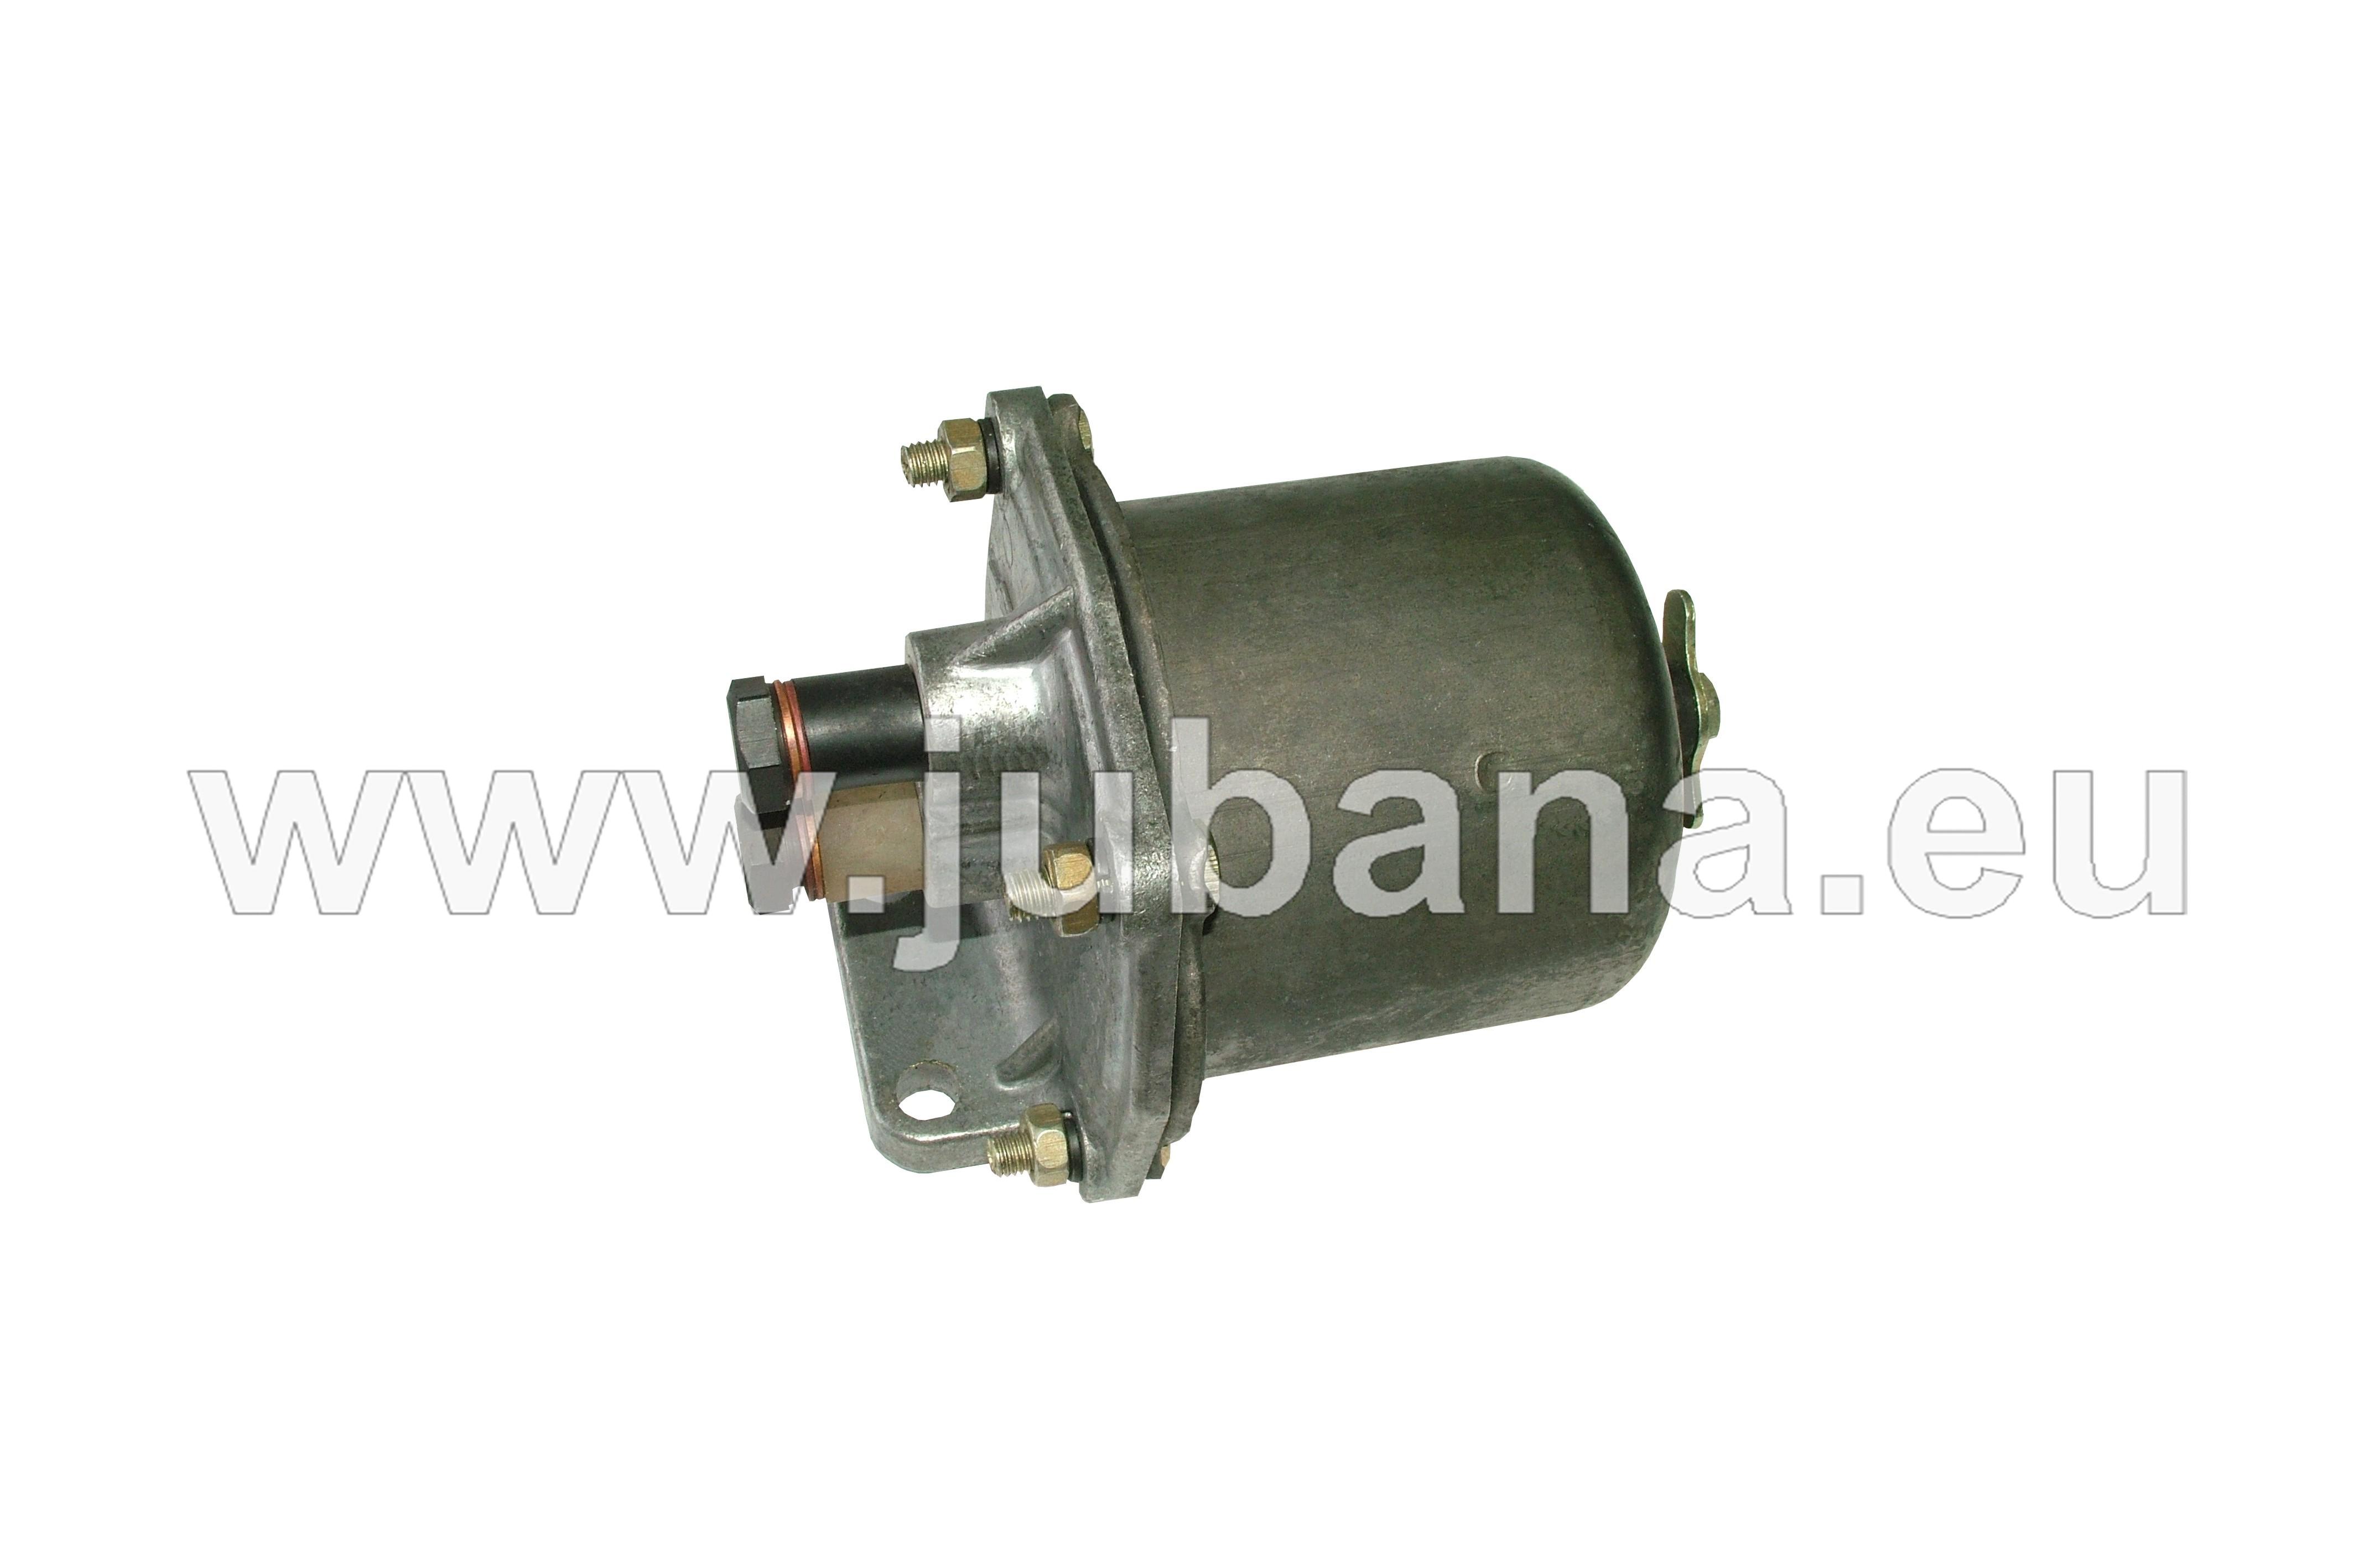 Coarse Fuel Filter Mtz 244602002 Jubana Ford Focus